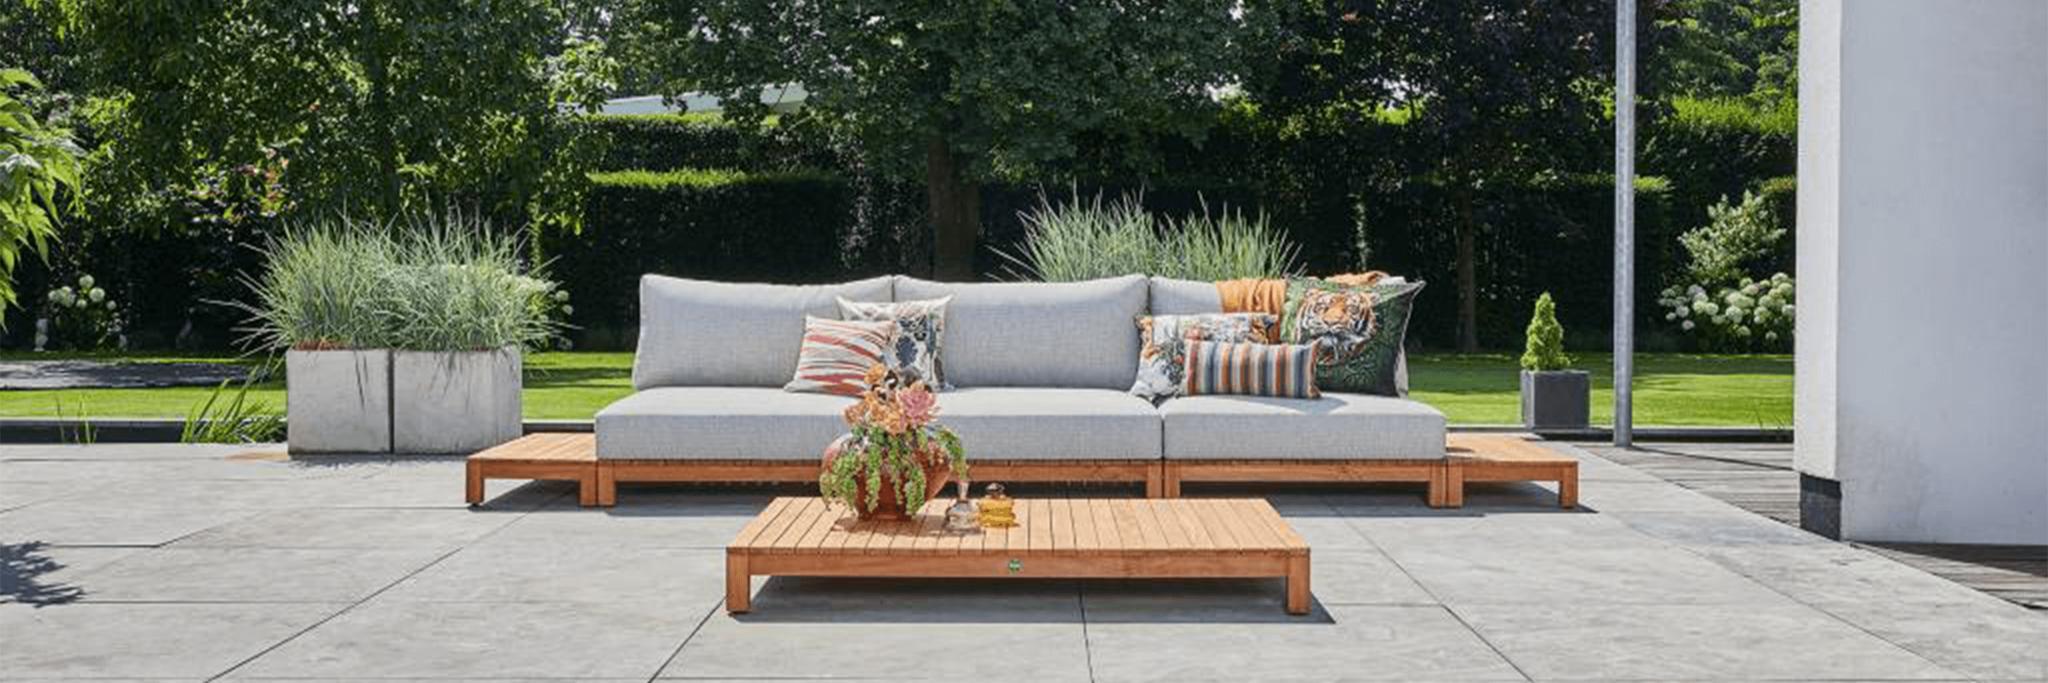 SUNS Portofino houten loungeset